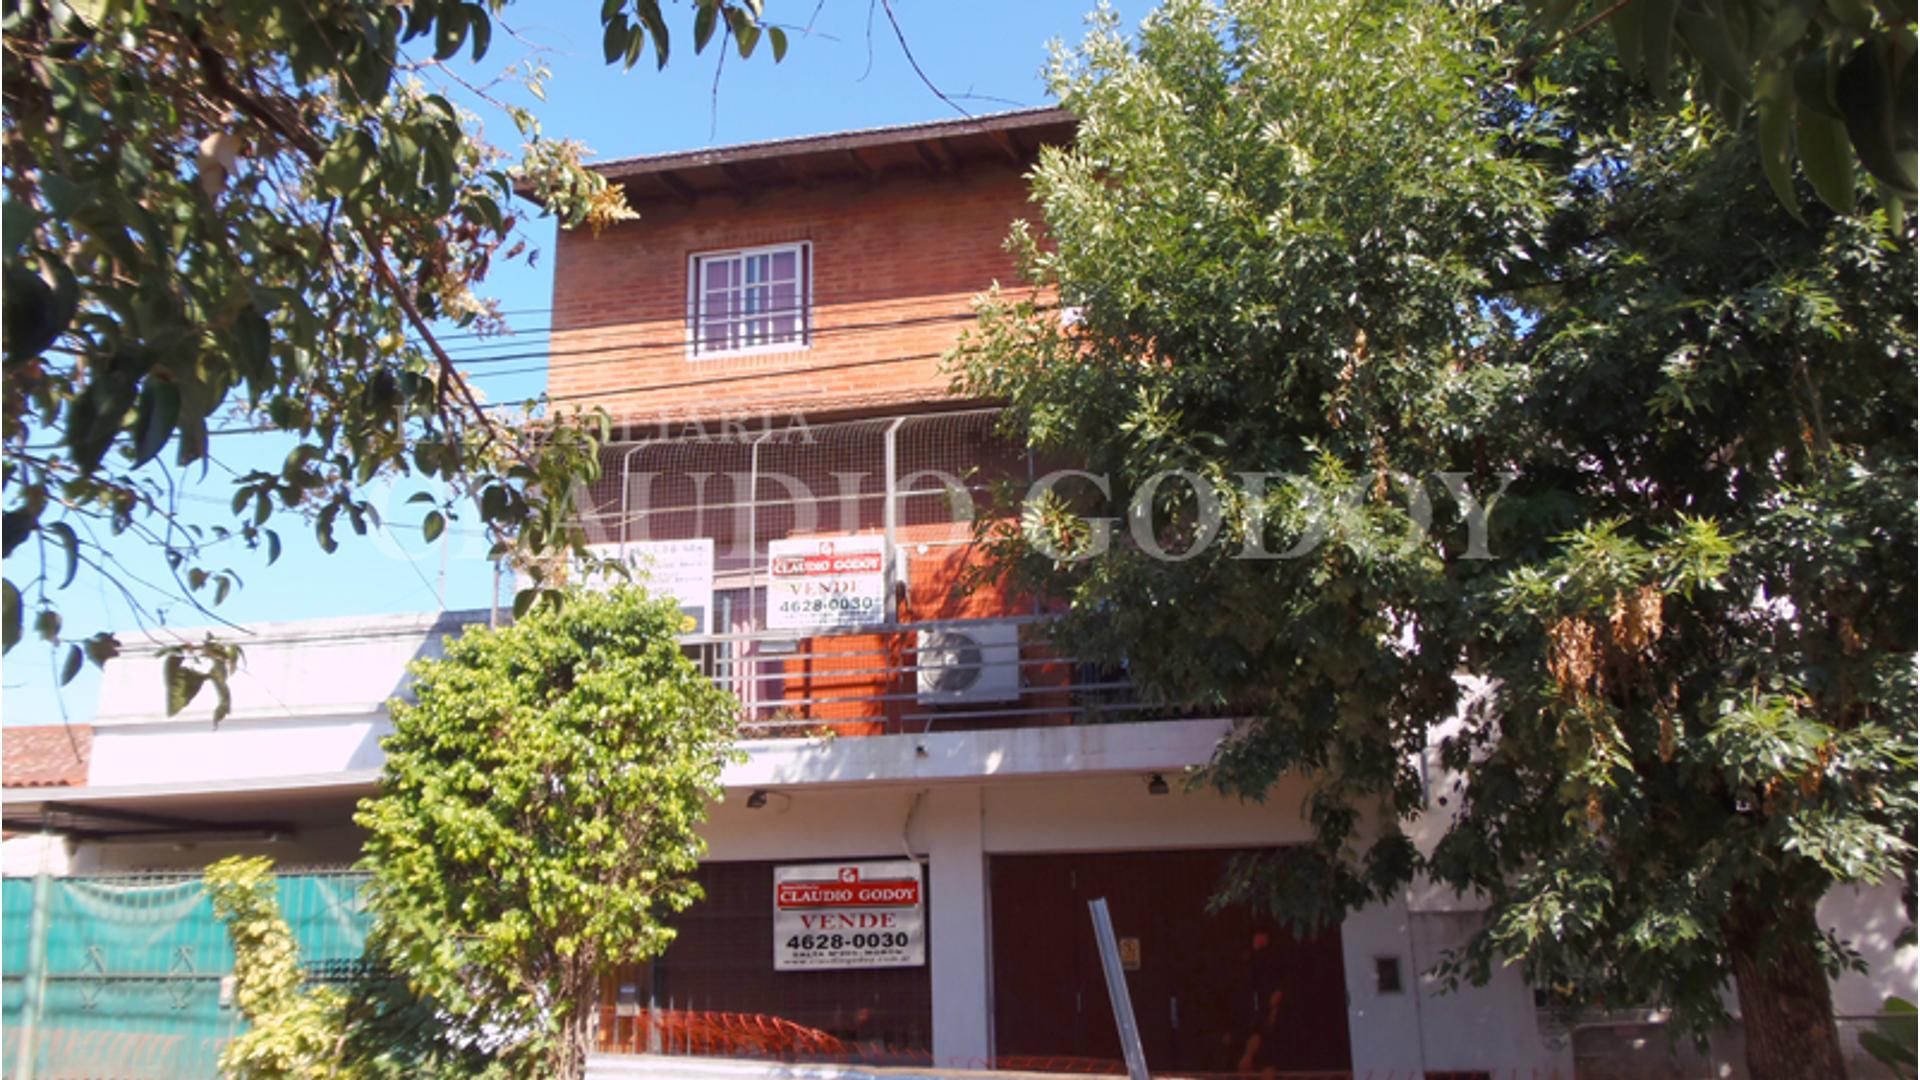 Lamadrid 1000 - U$D 140.000 - Tipo casa PH en Venta